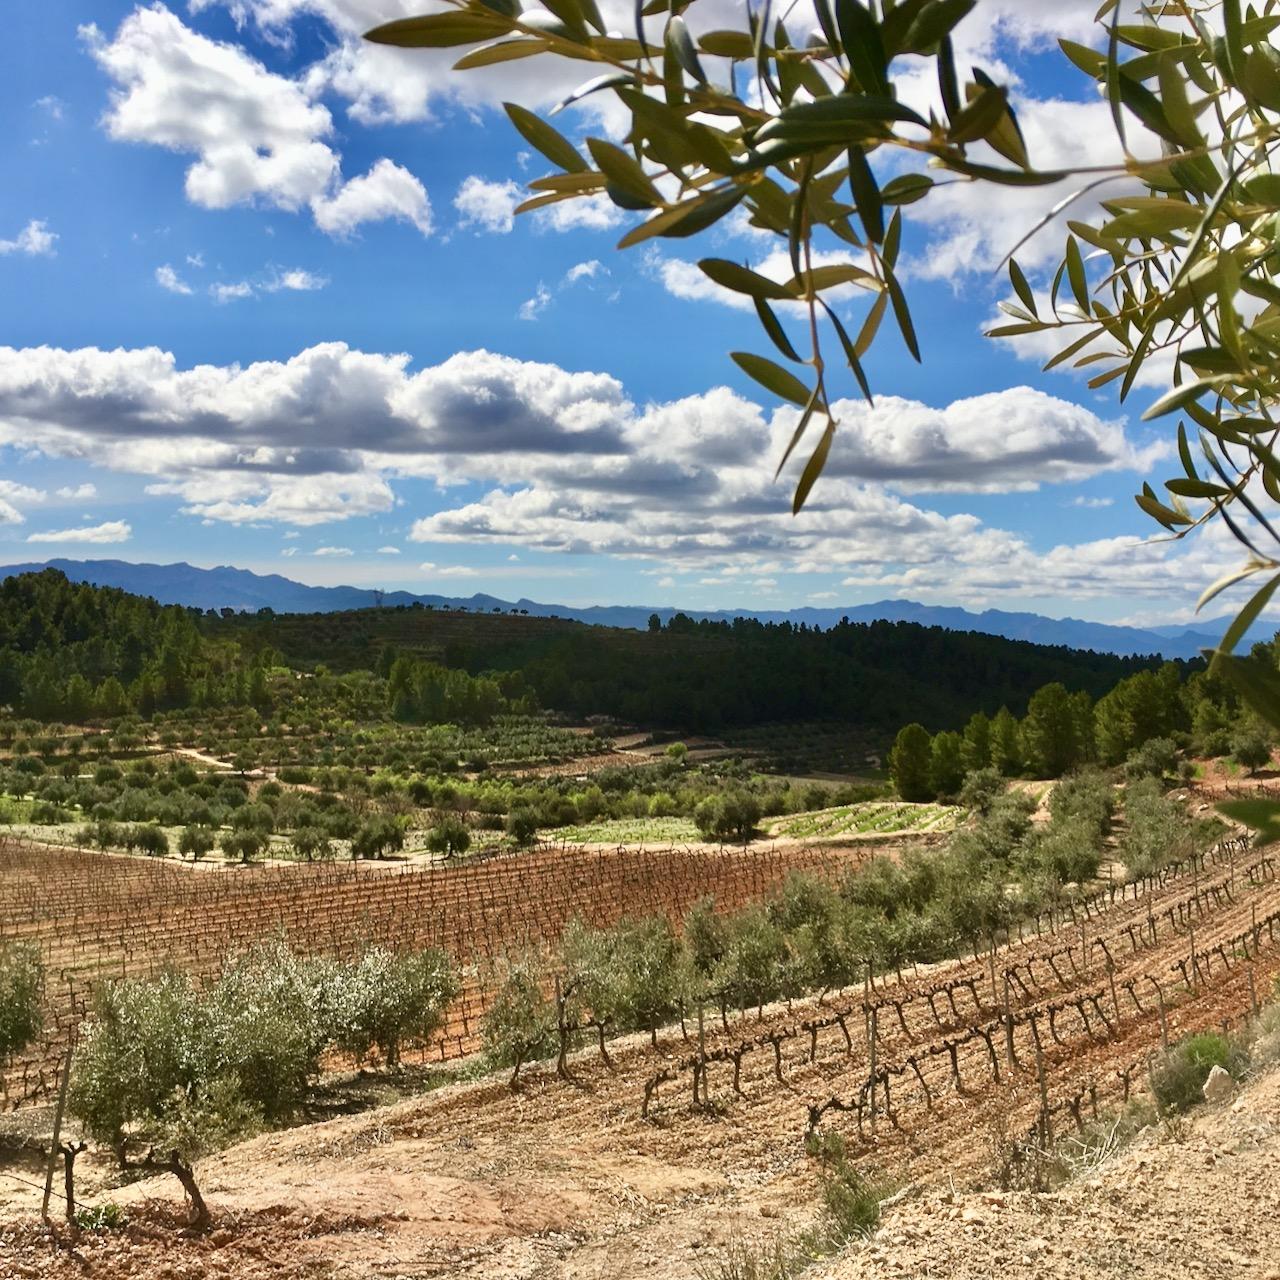 Morlanda vineyards